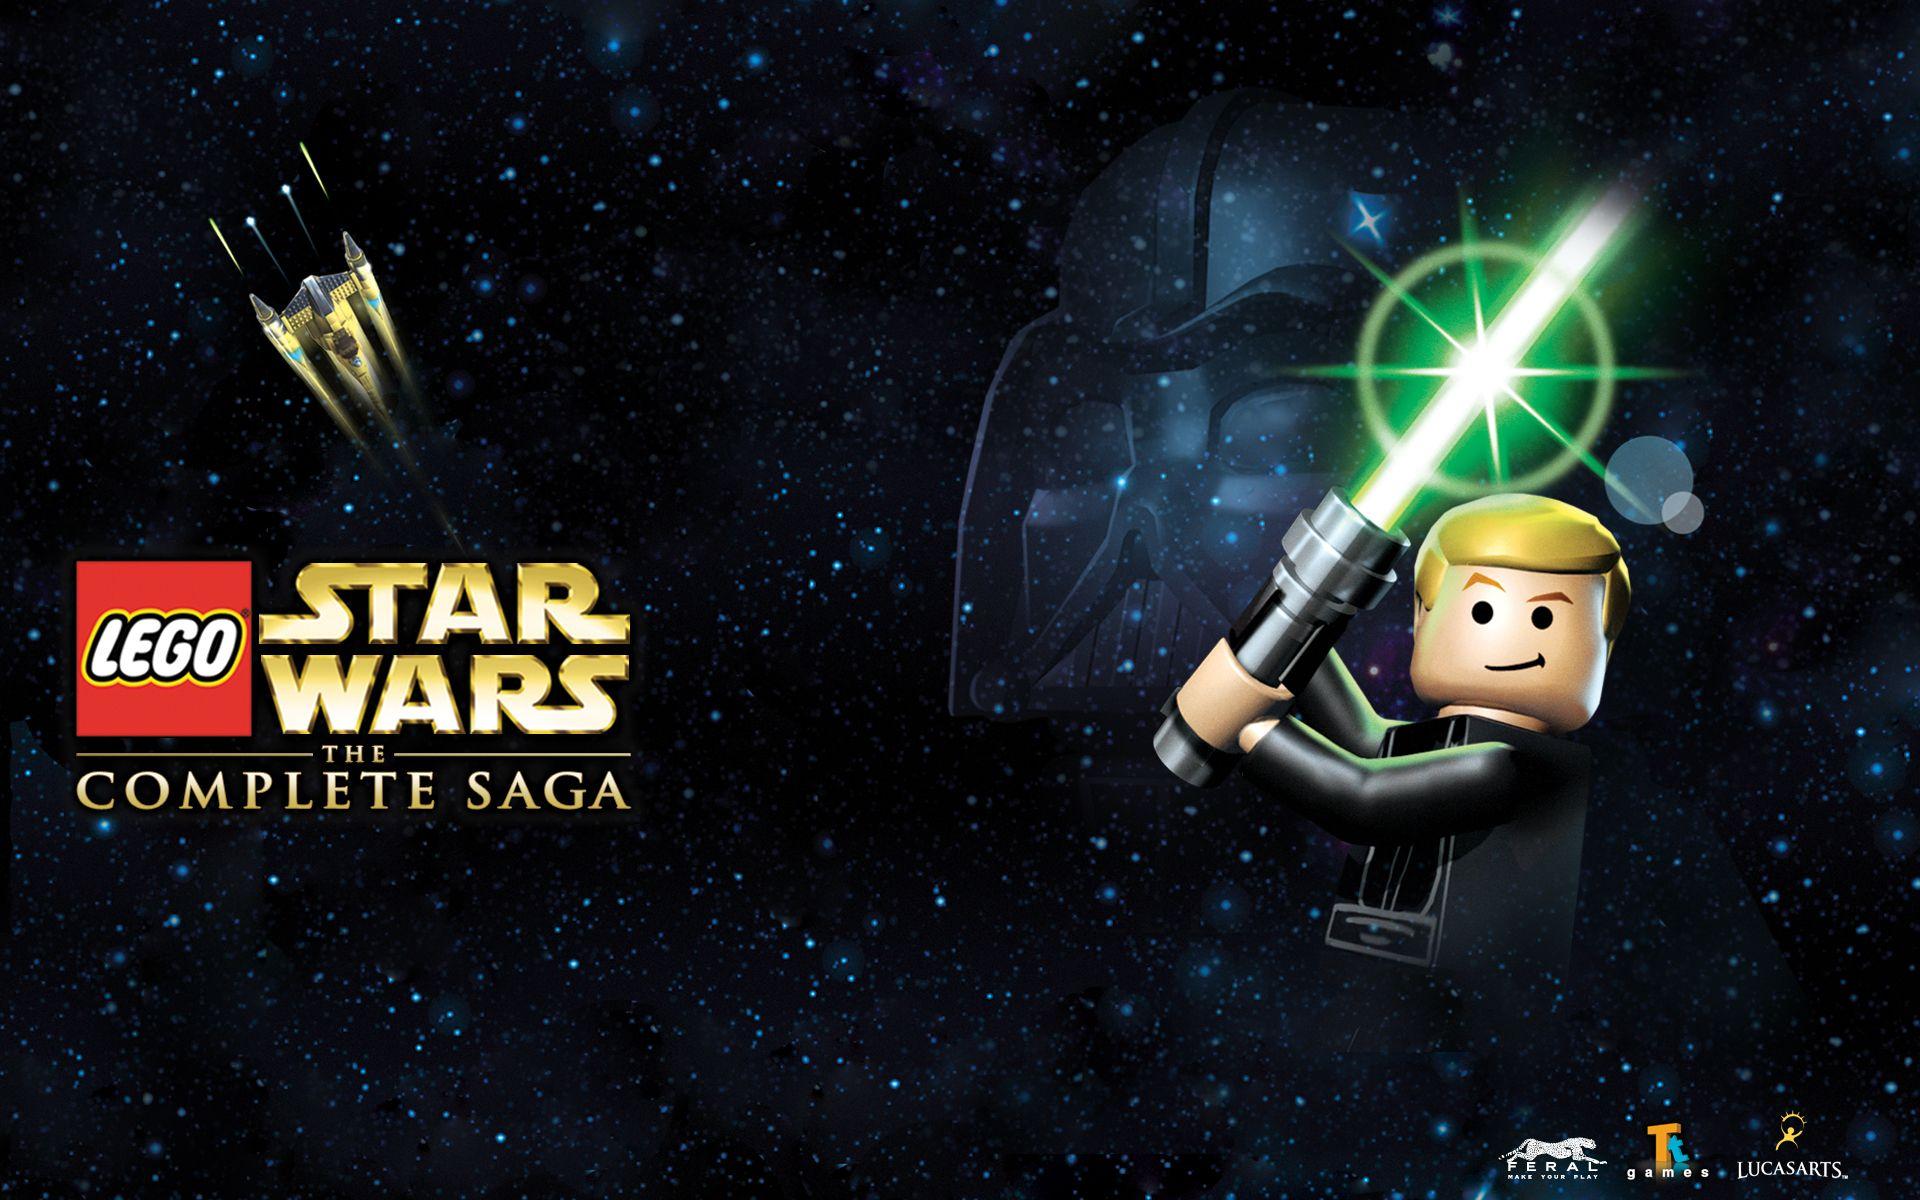 Lego Star Wars Desktop Background